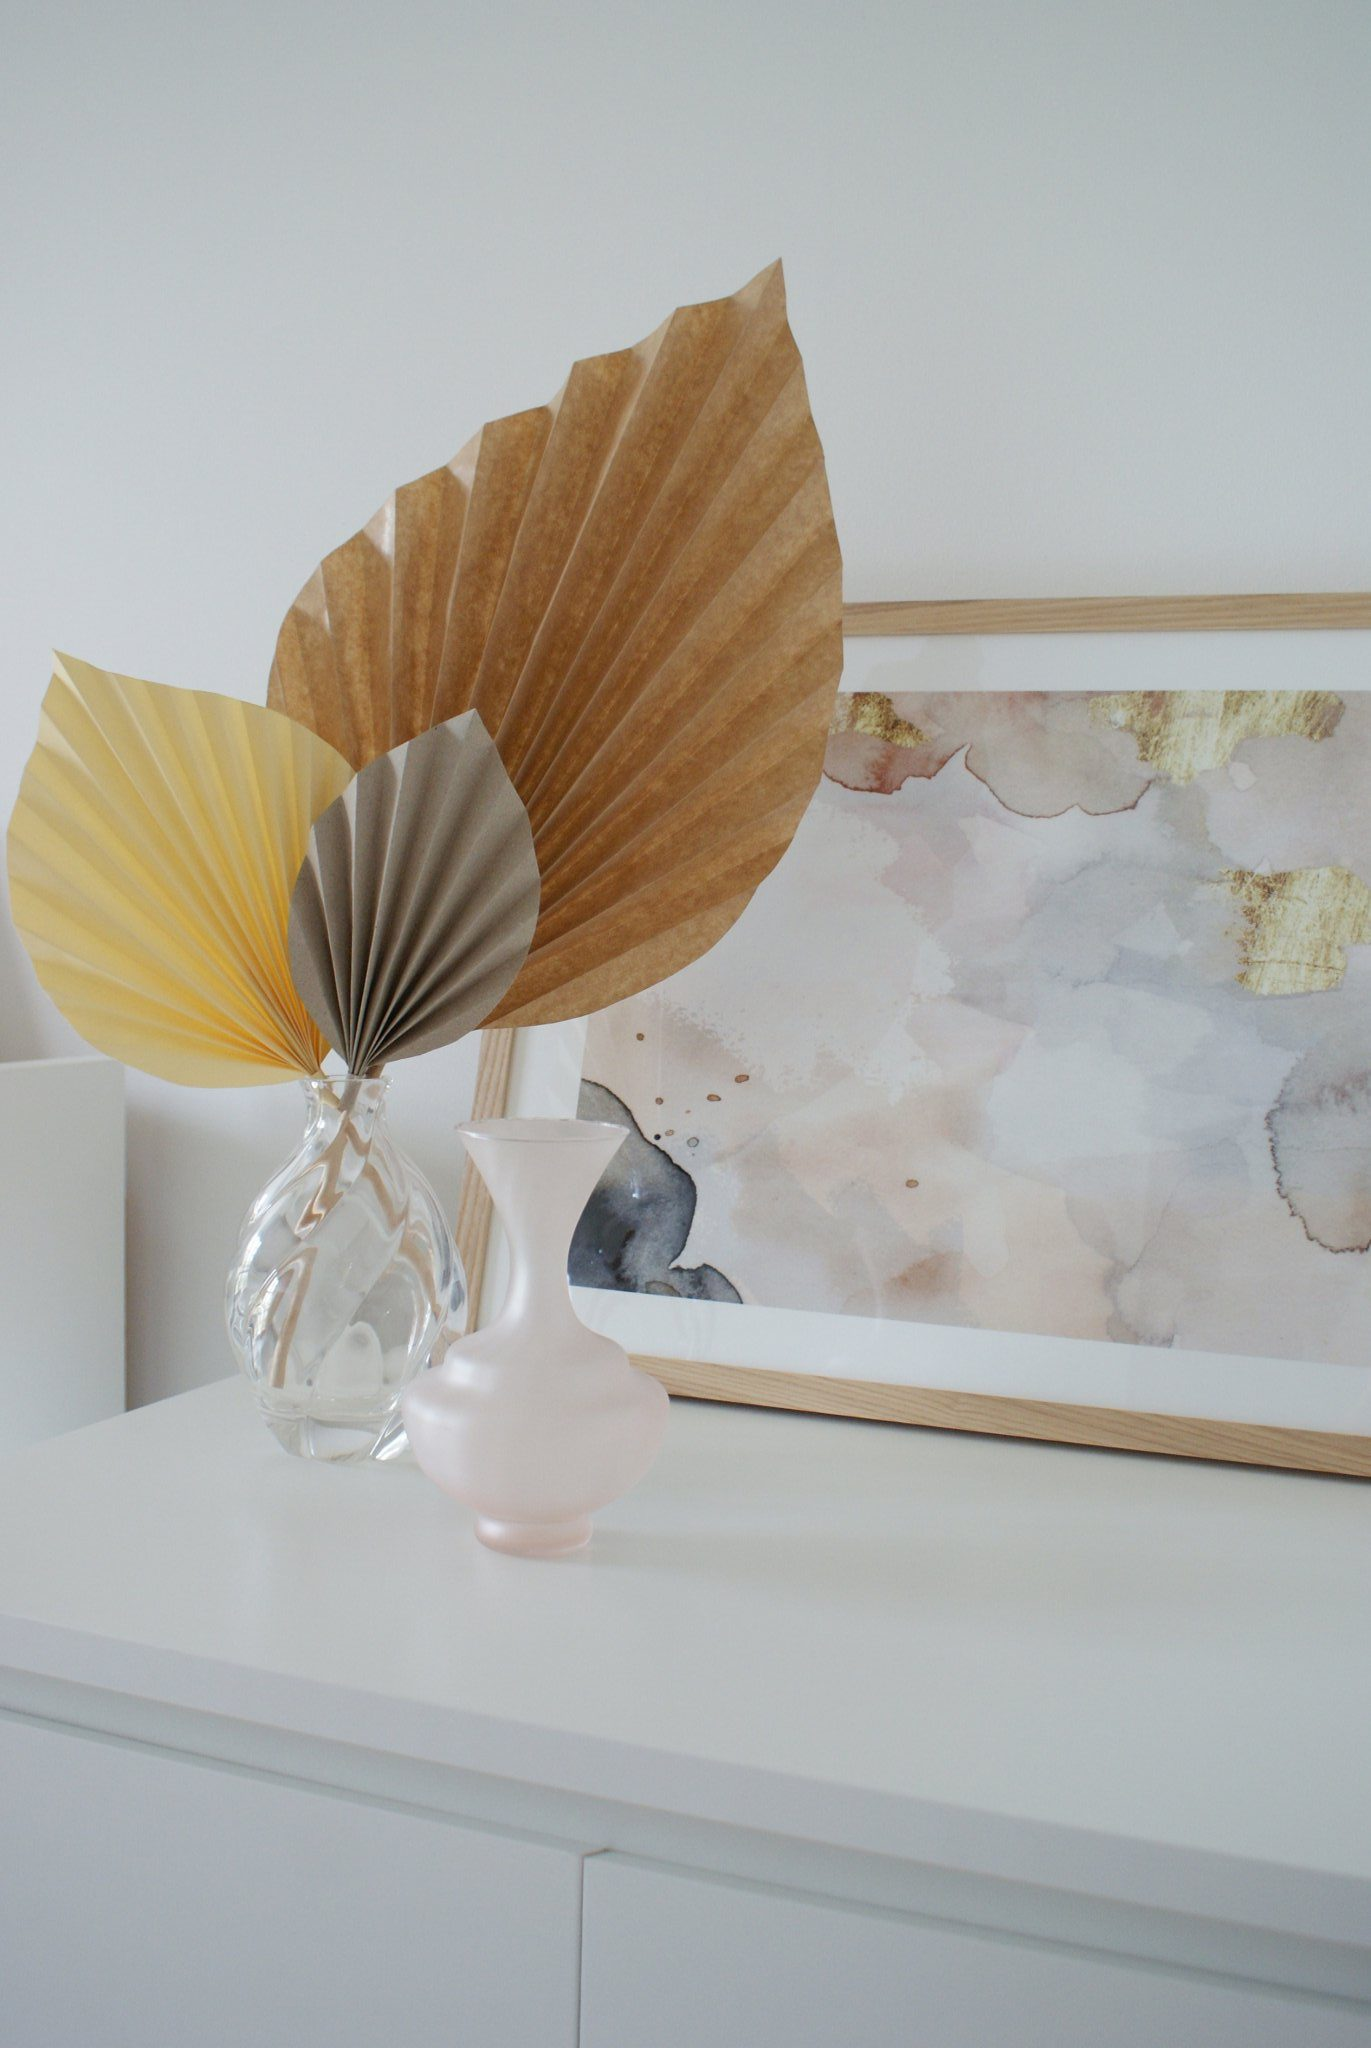 diy palm paper leaf leaves decor idea handmade craft easy simple tutorial home decoration neutral minimalist francinesplaceblog 5